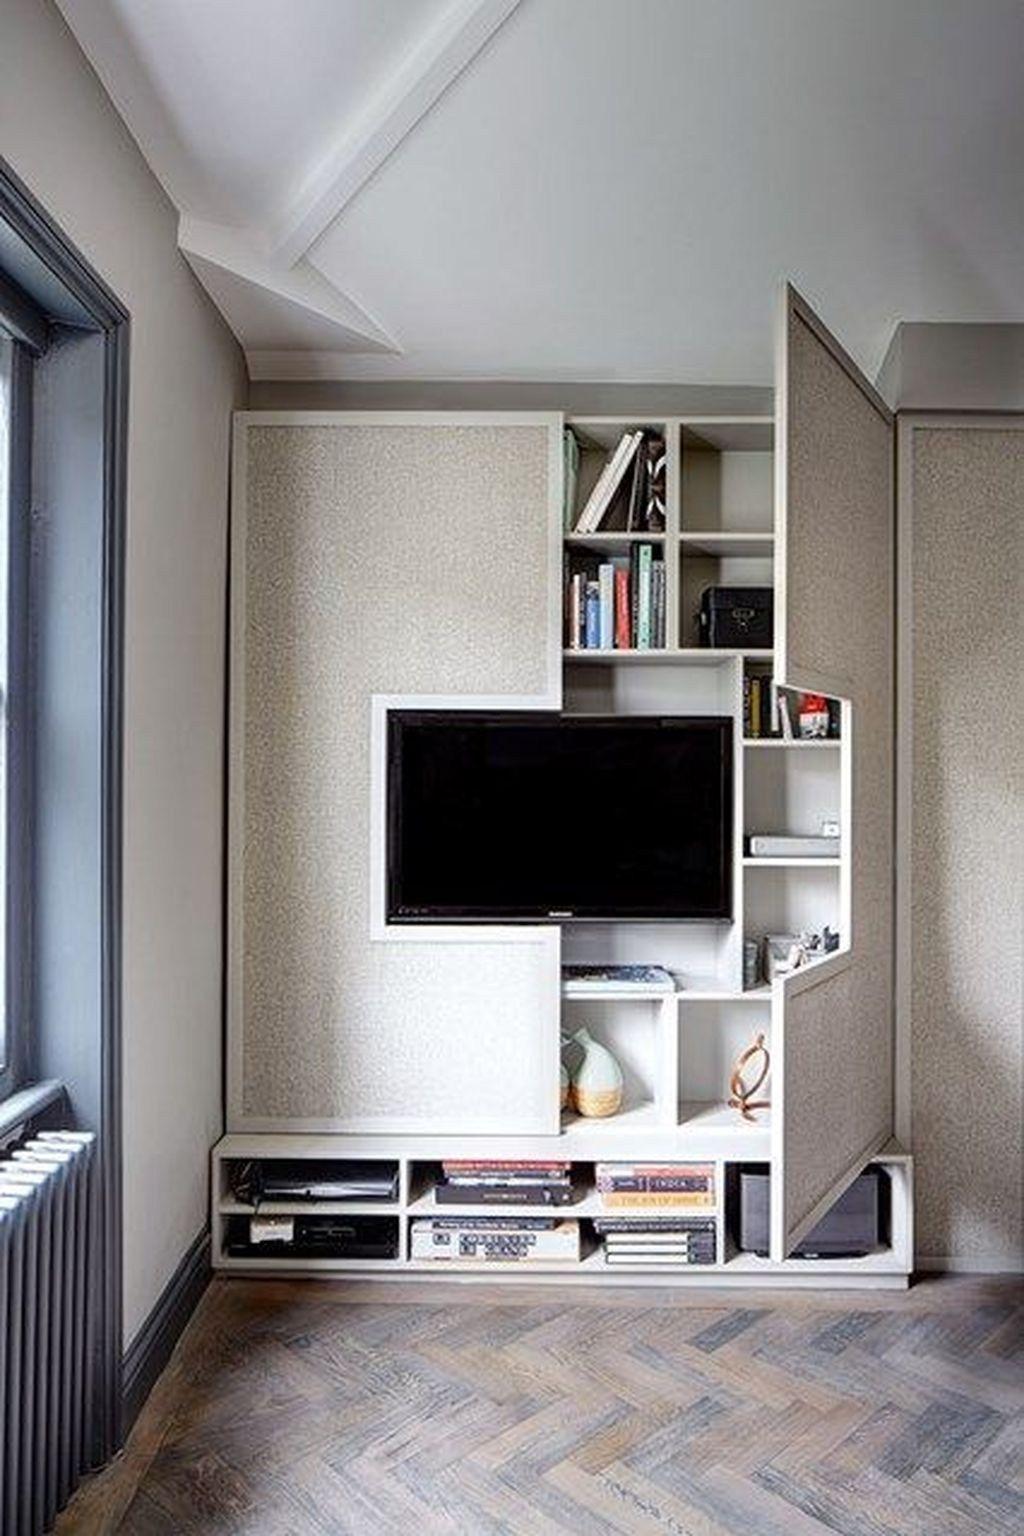 Genius Space Saving Hacks For Your Tiny House 29 Apartment Interior Diy Bedroom Storage House Interior